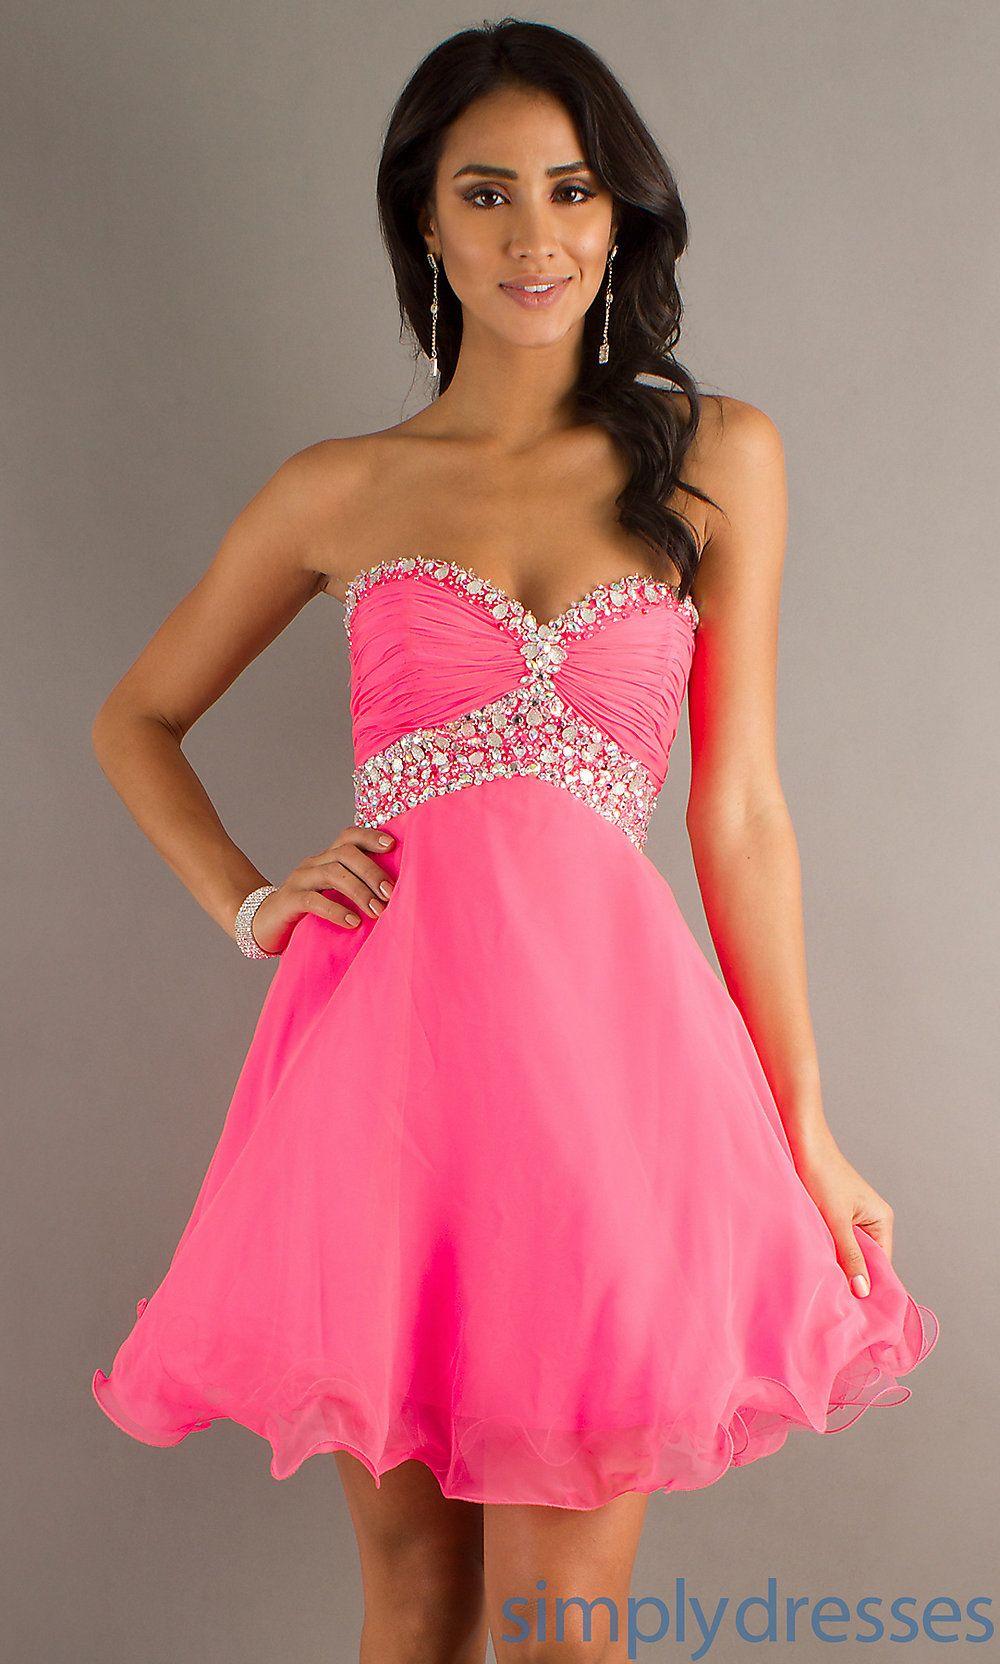 Bridesmaid dress - neon wedding dress | Bridesmaid Dresses | Pinterest